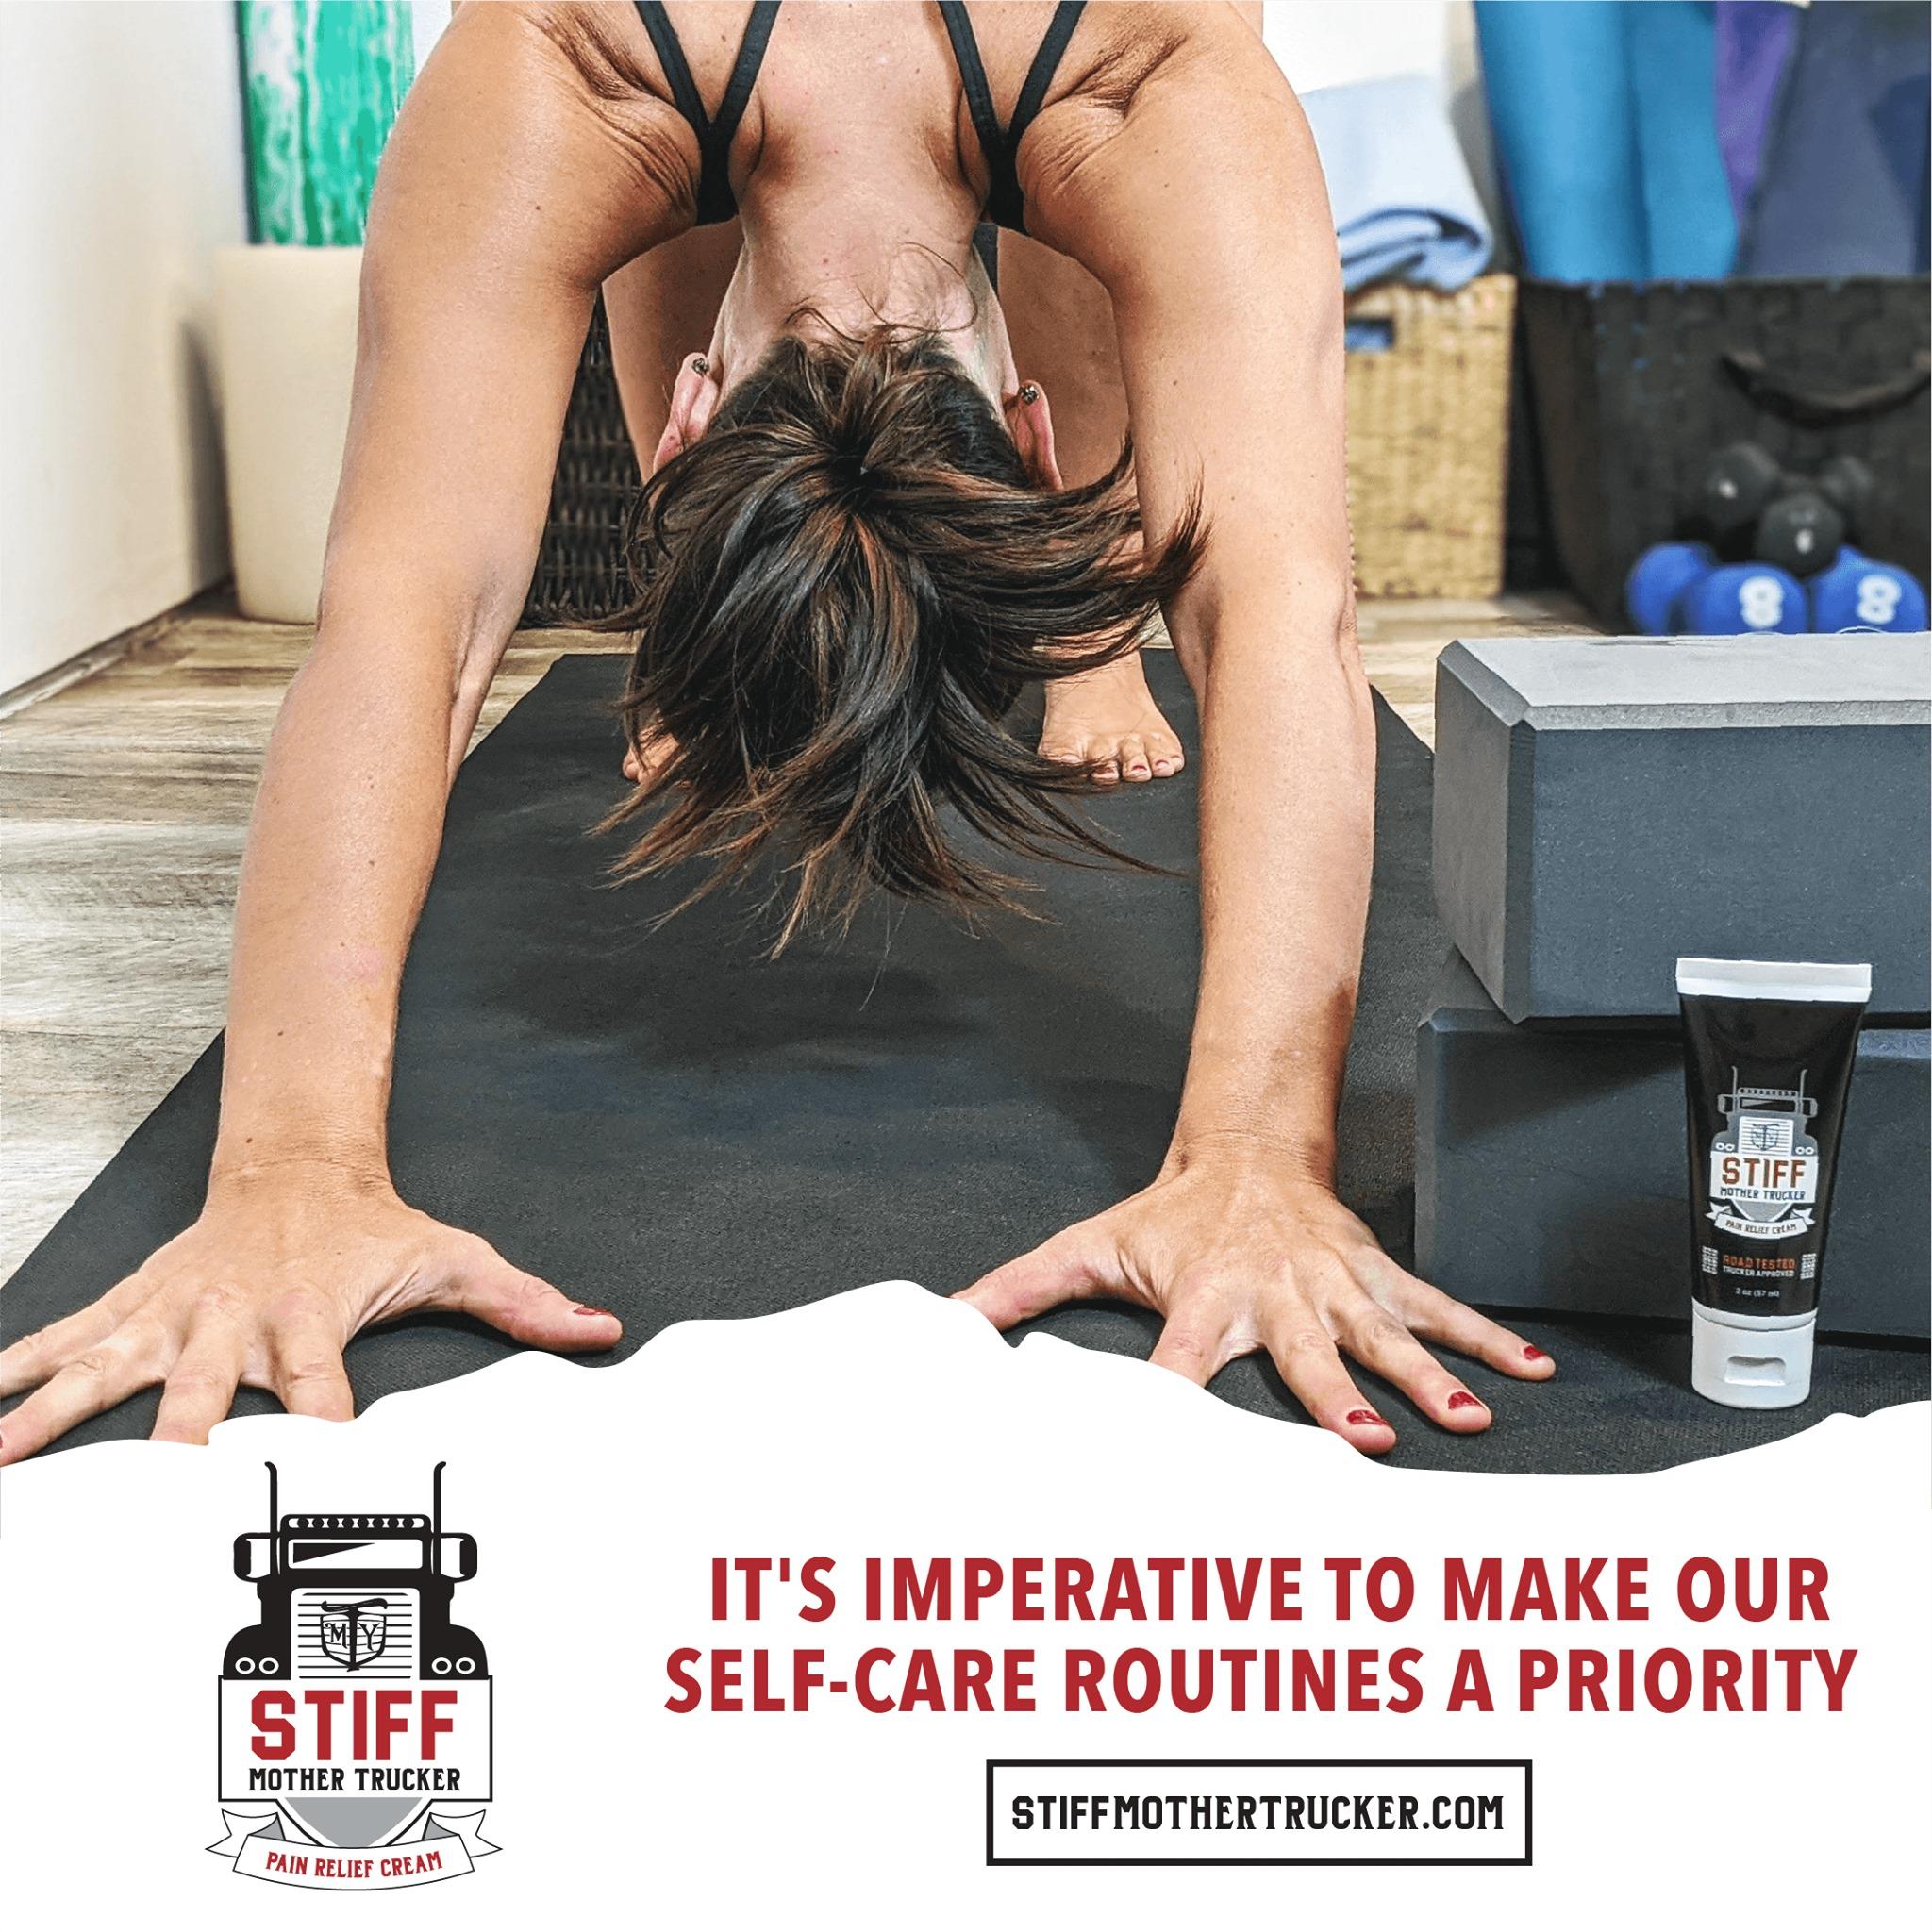 STIFF Mother Trucker for Yoga